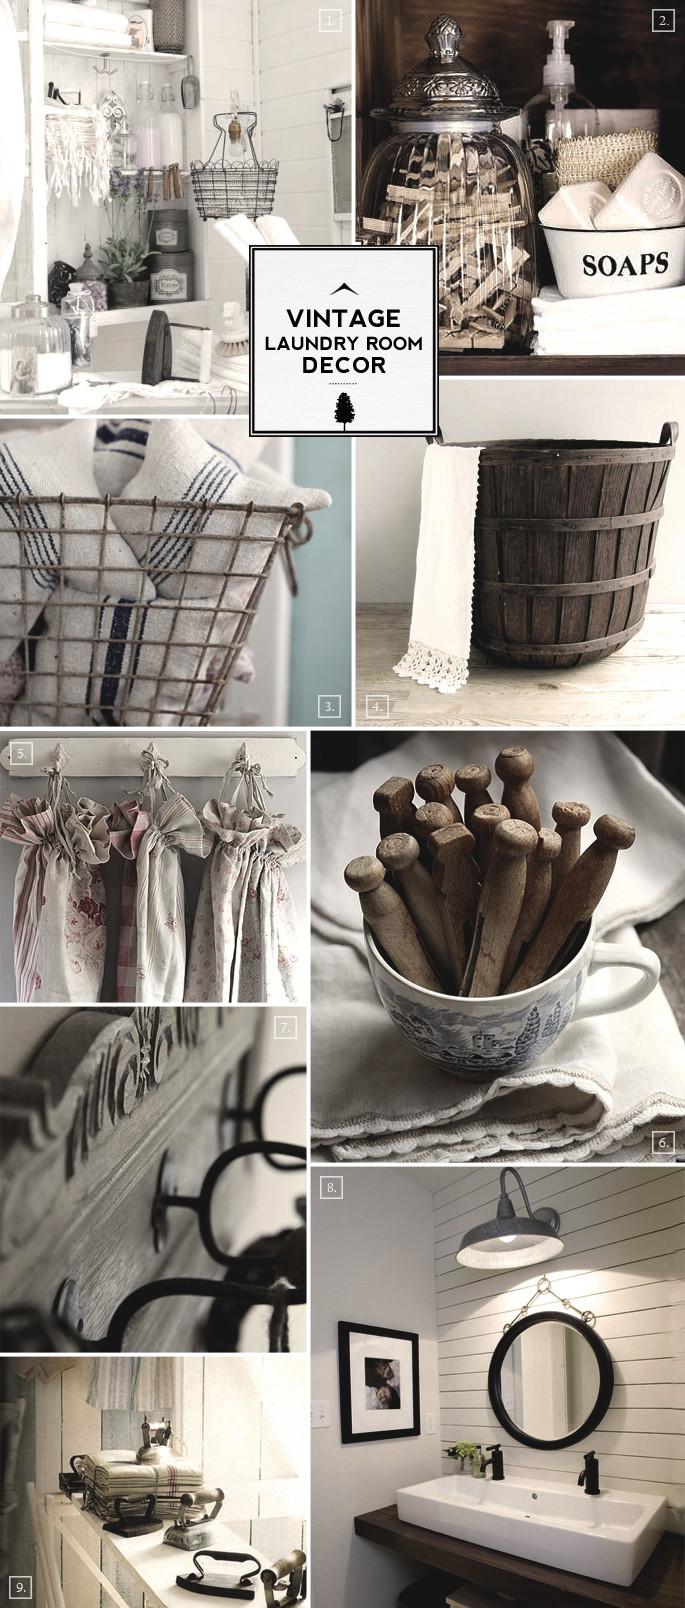 Best ideas about Vintage Laundry Room Decor . Save or Pin Style Guide Vintage Laundry Room Decor Ideas Now.